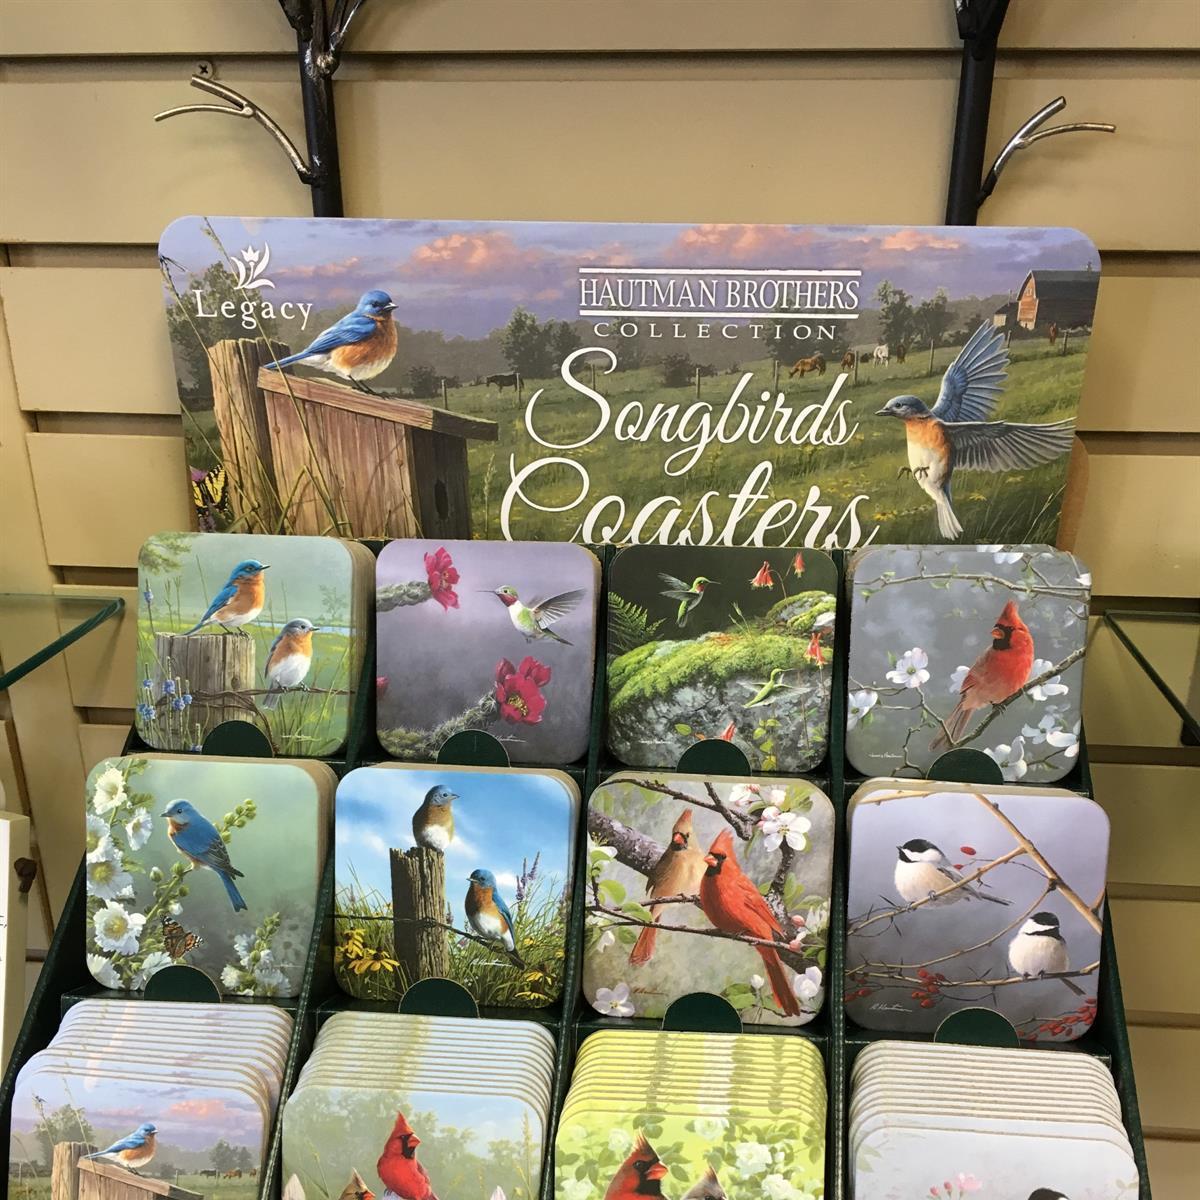 coaster, songbirds, bluebird, cardinal, chickadee, gift, home decor, hummingbird